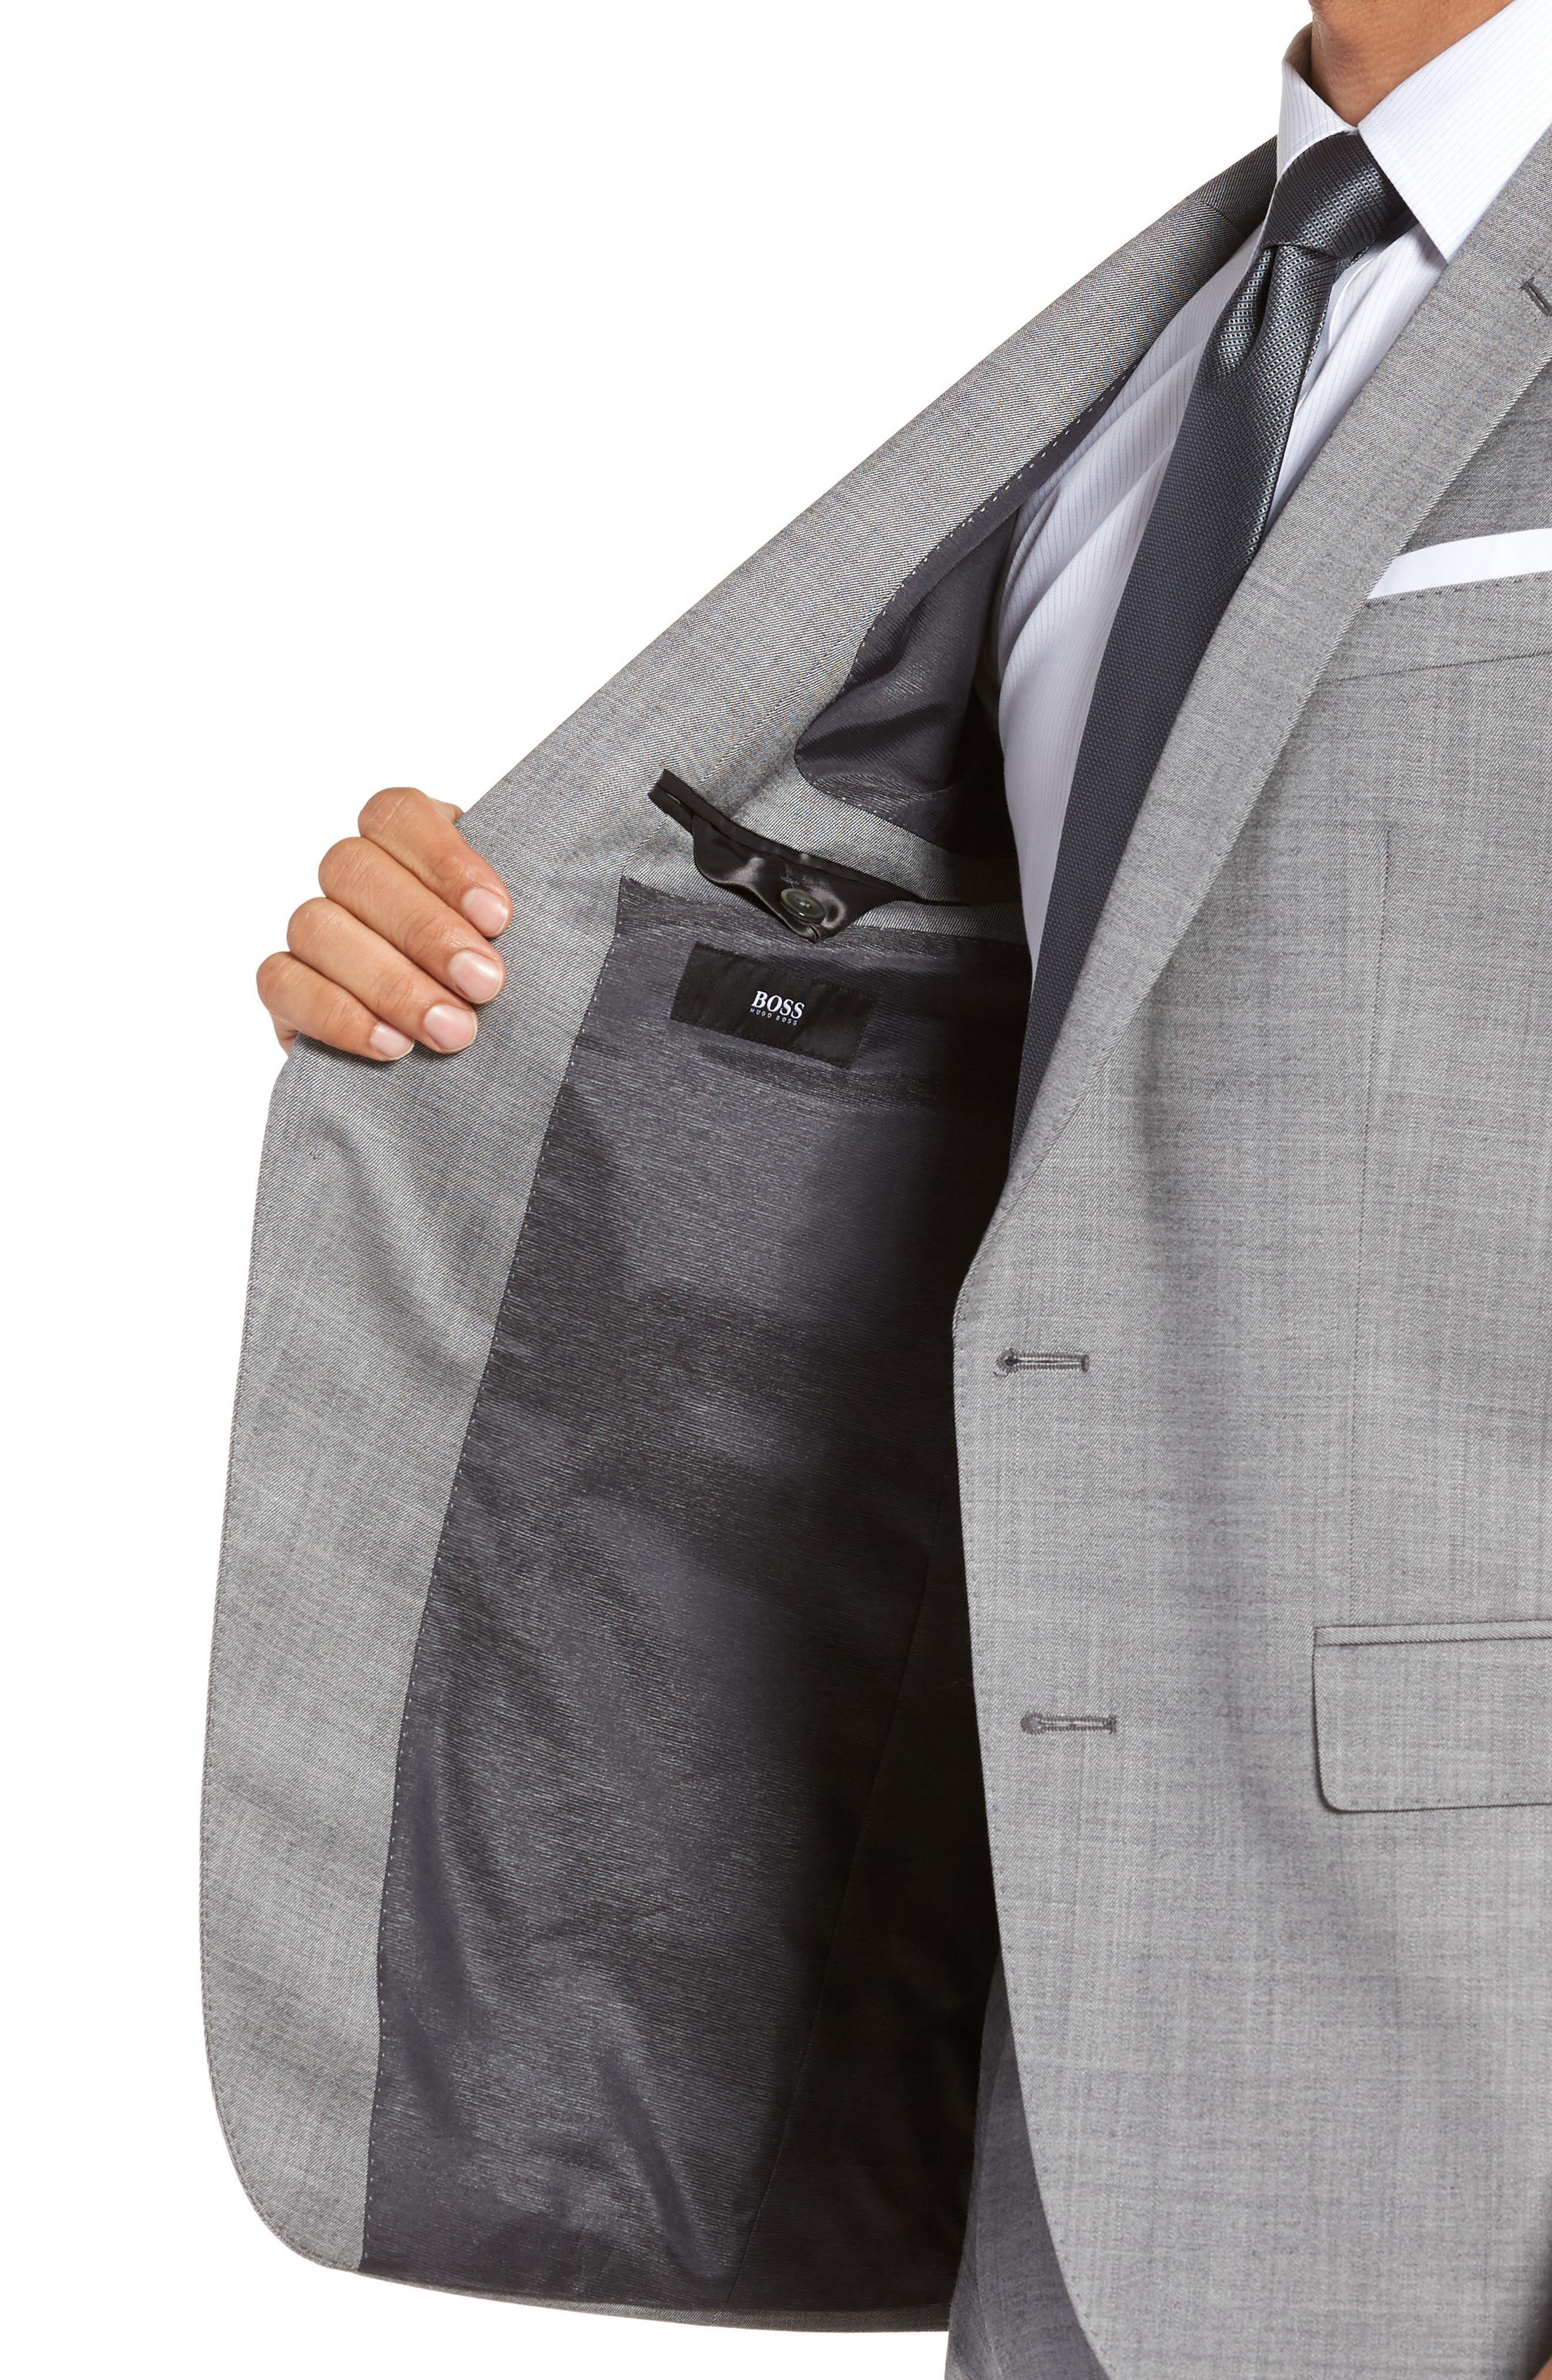 Hutsons/Gander Trim Fit Solid Wool & Silk Suit,                             Alternate thumbnail 4, color,                             020